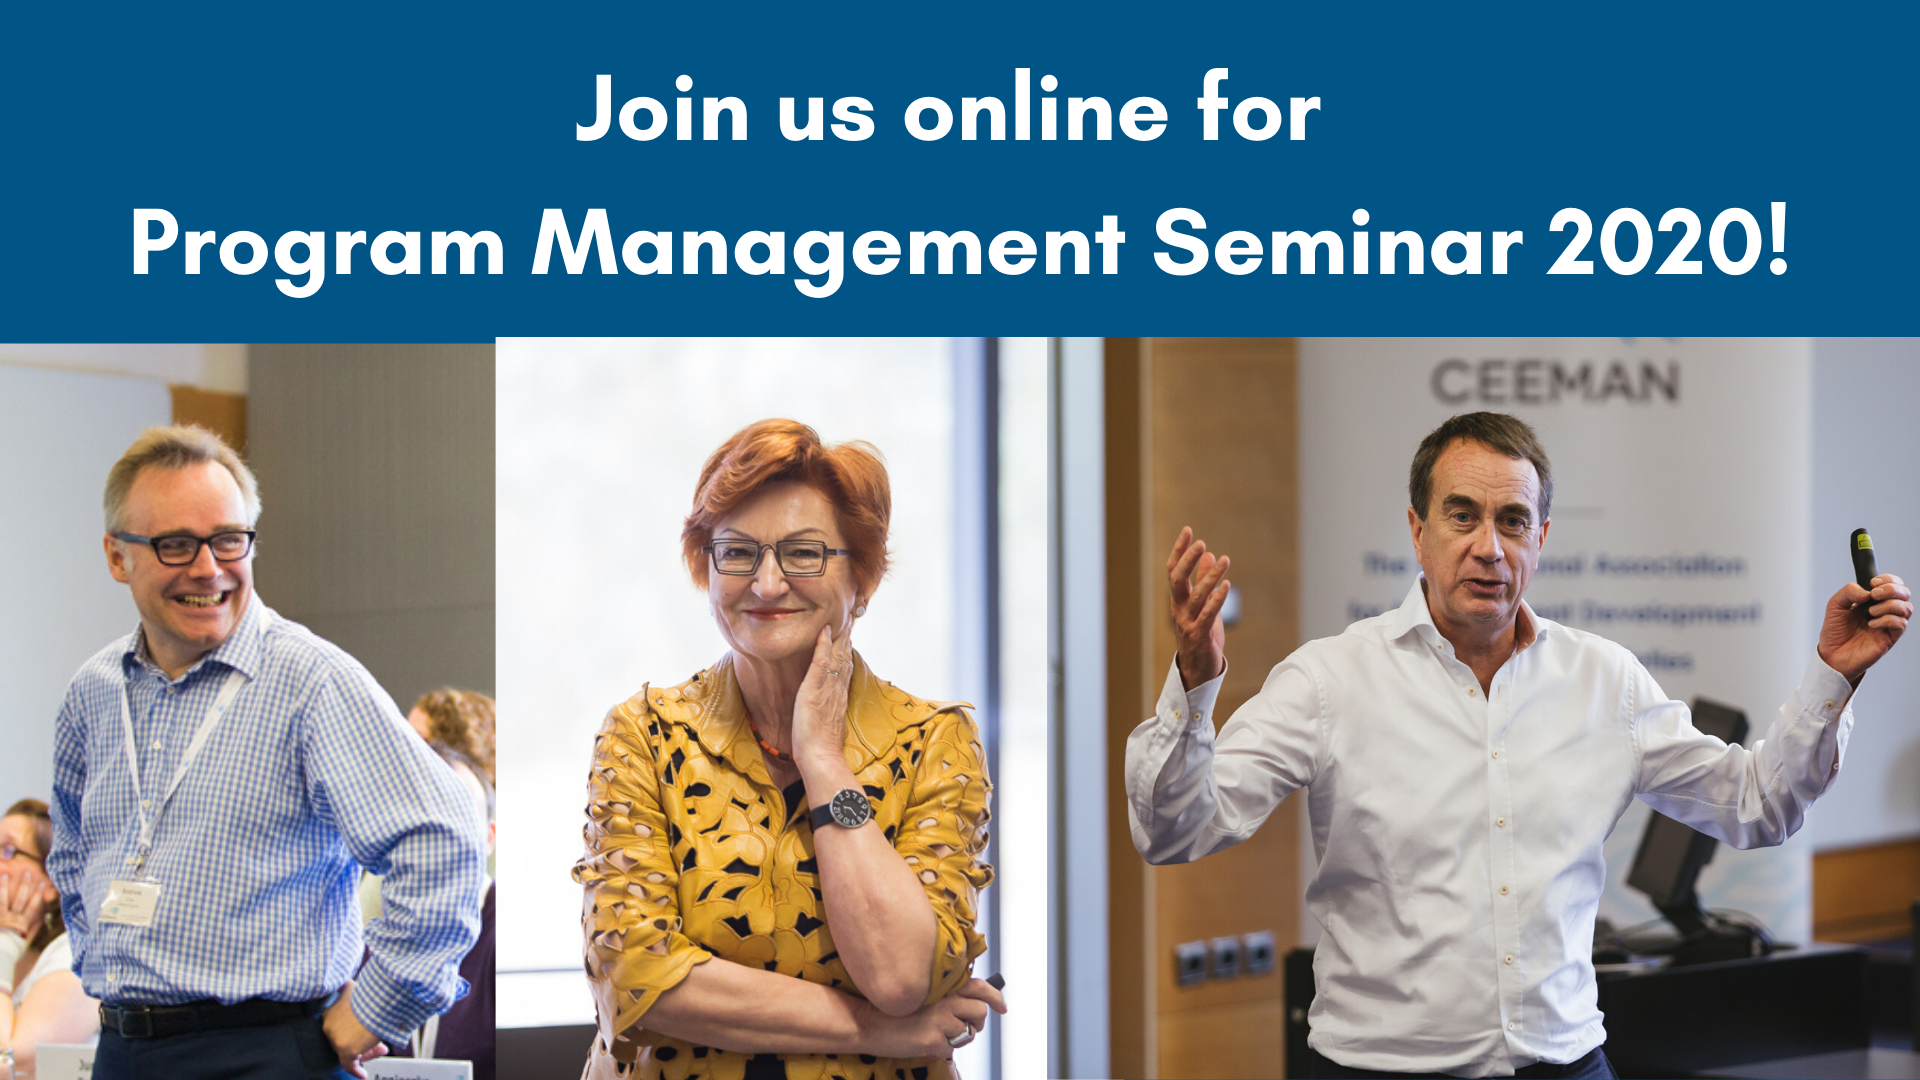 Join the online Program Management Seminar 2020